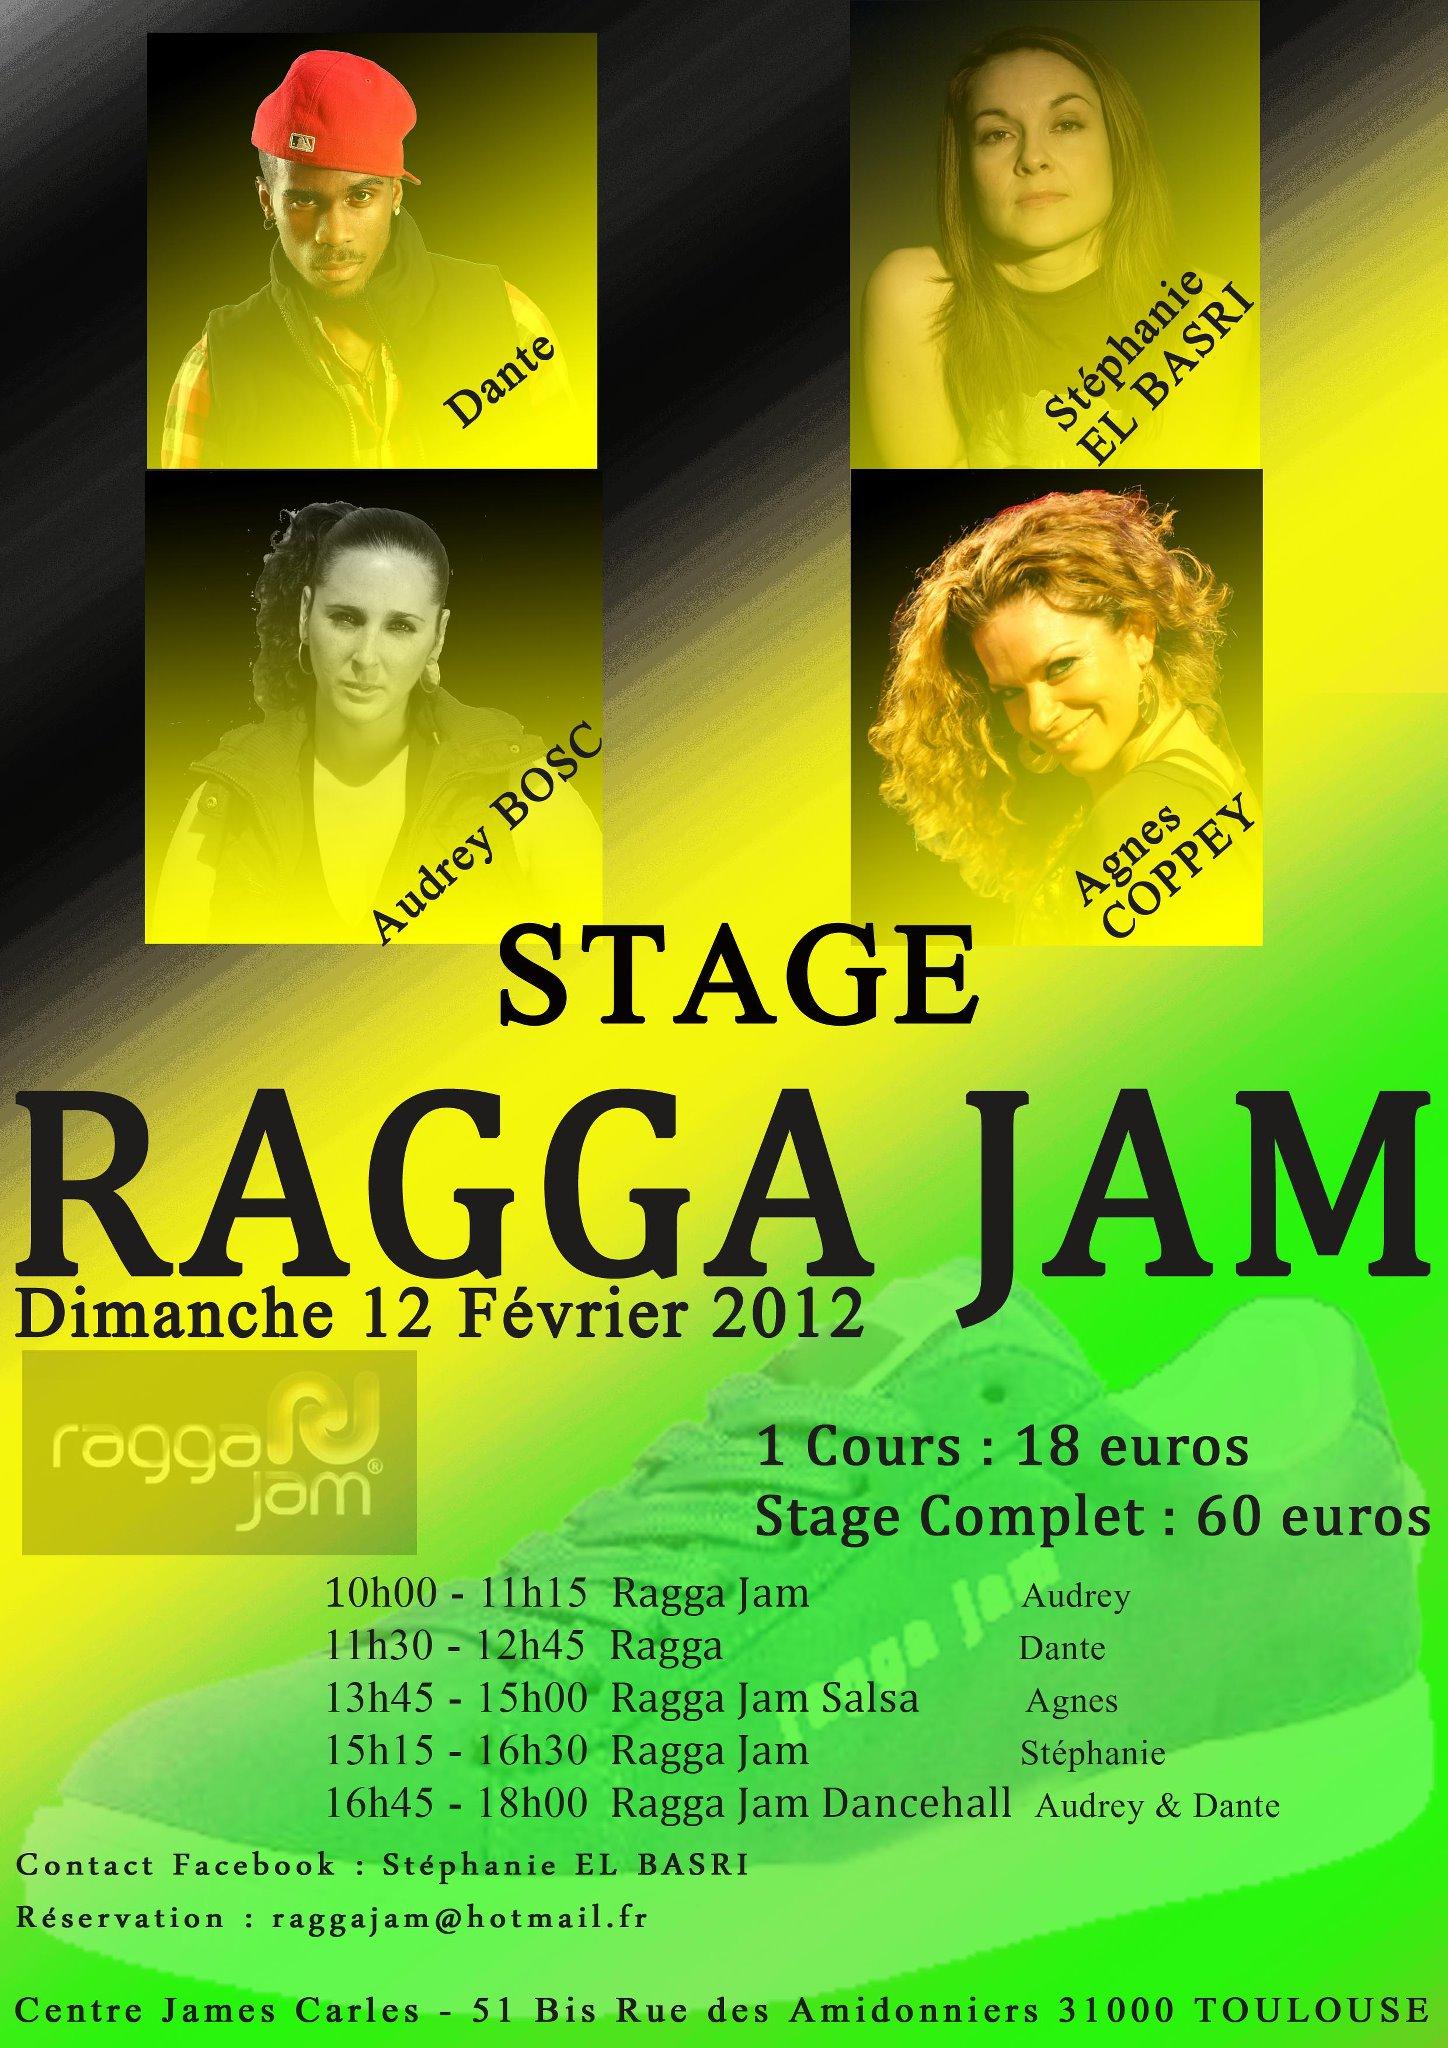 Ragga Jam 12 février